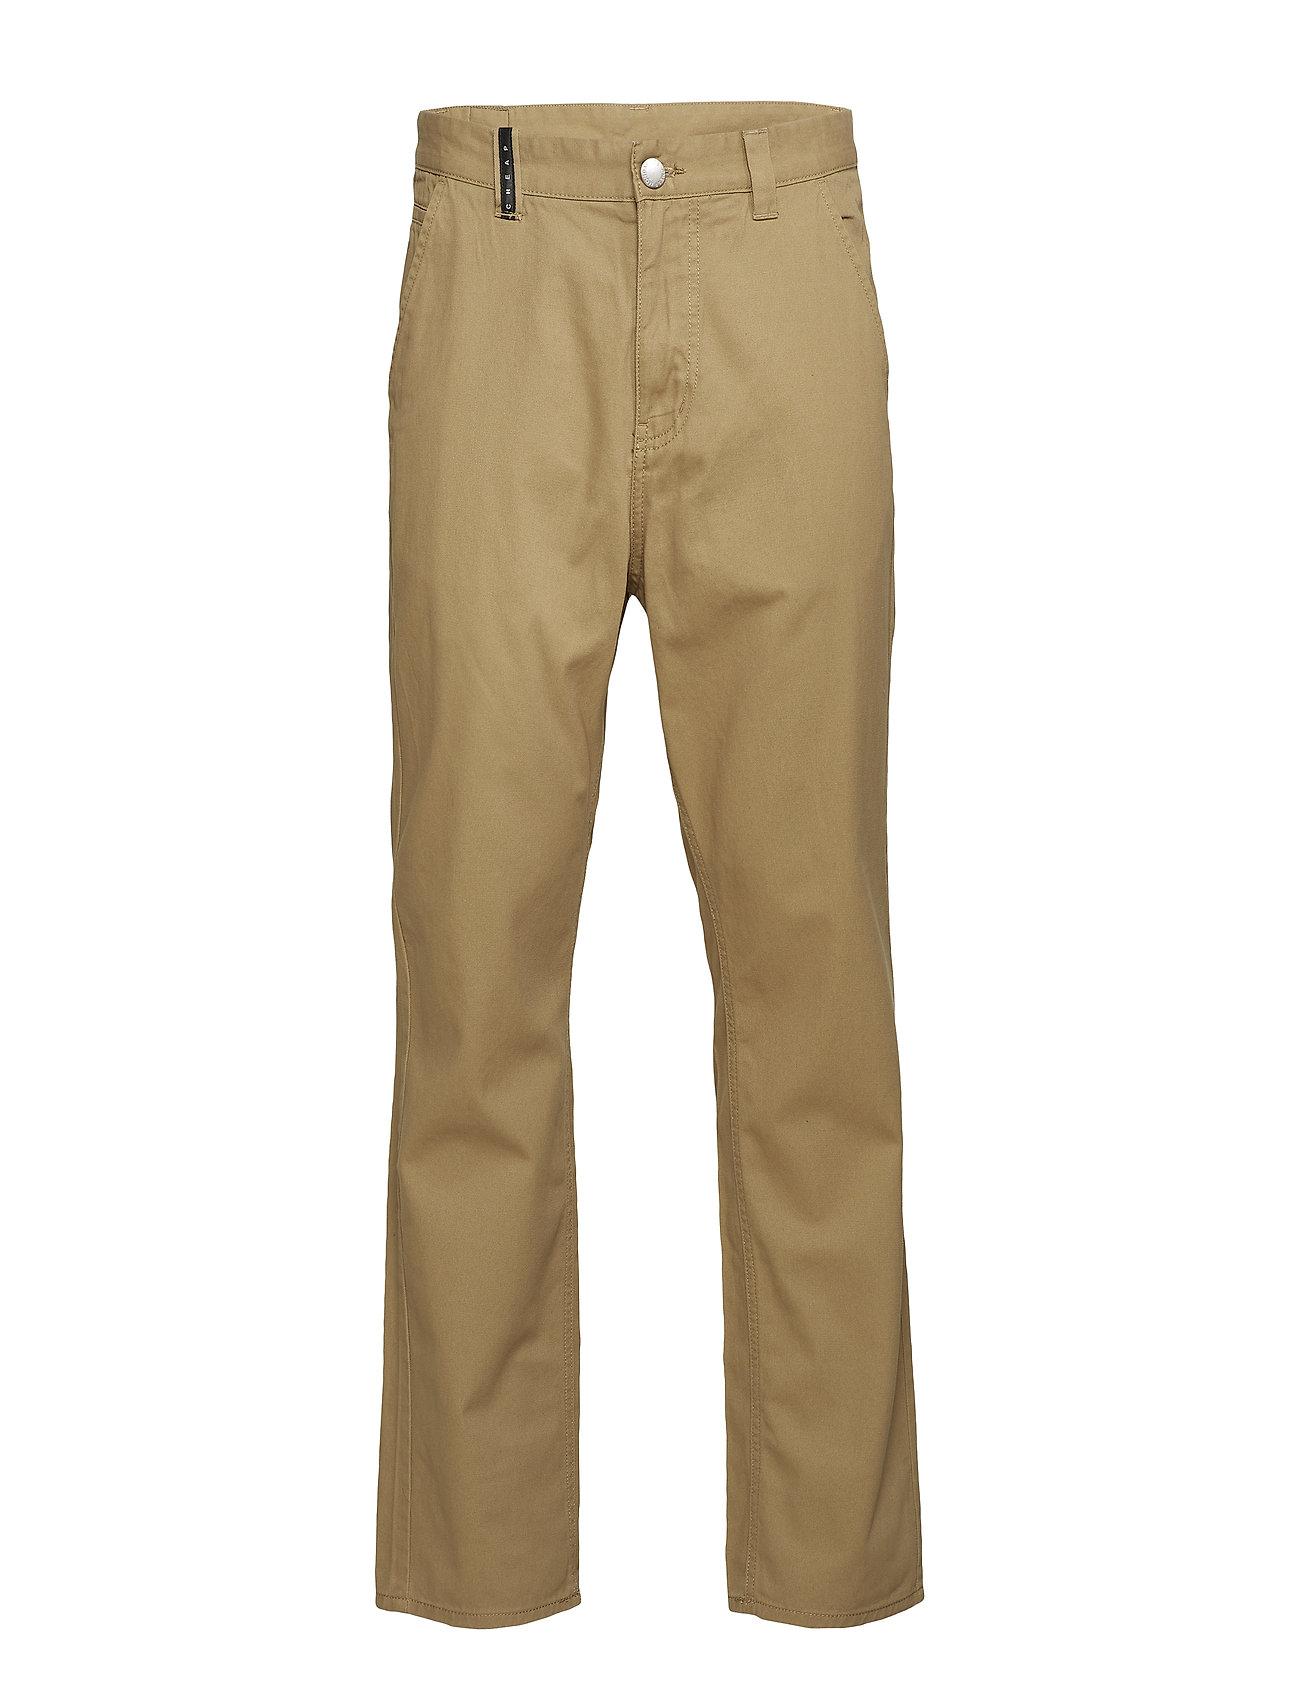 Cheap Monday Neo trousers Light tan - LIGHT TAN